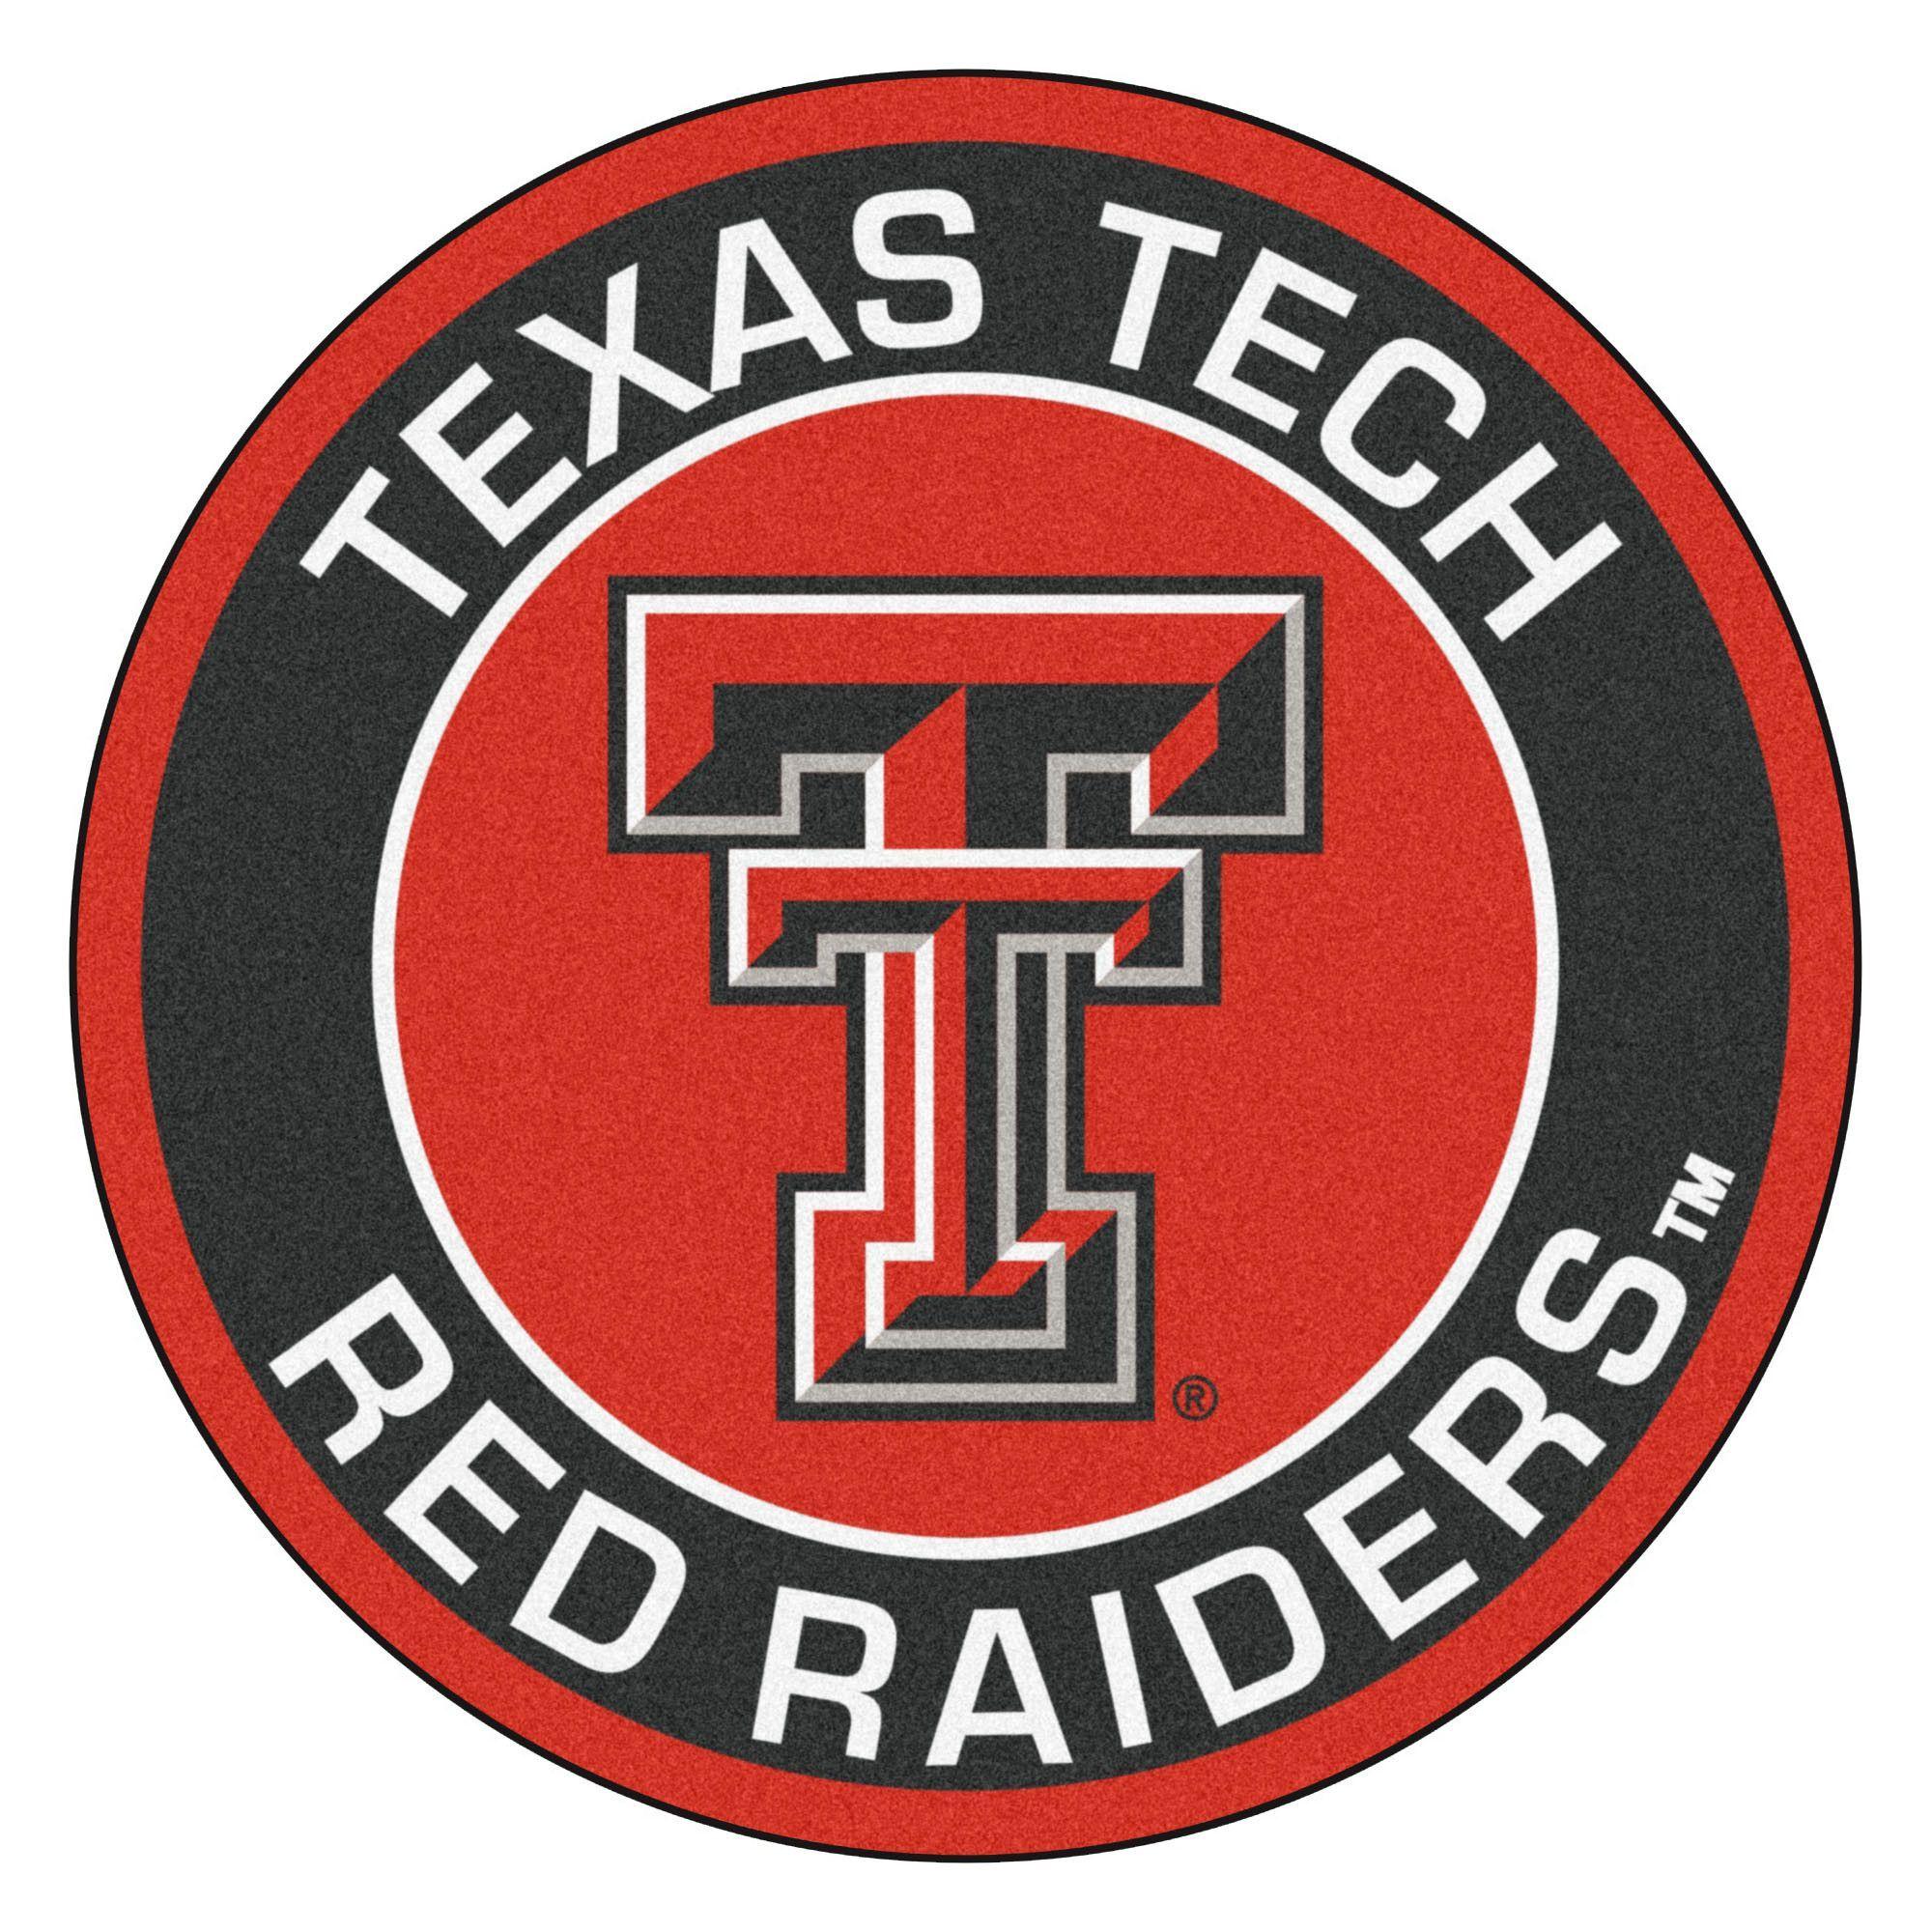 Ncaa Texas Tech University Roundel 27 In X 27 In Non Slip Indoor Only Mat In 2020 Texas Tech Red Raiders Texas Tech University Texas Tech